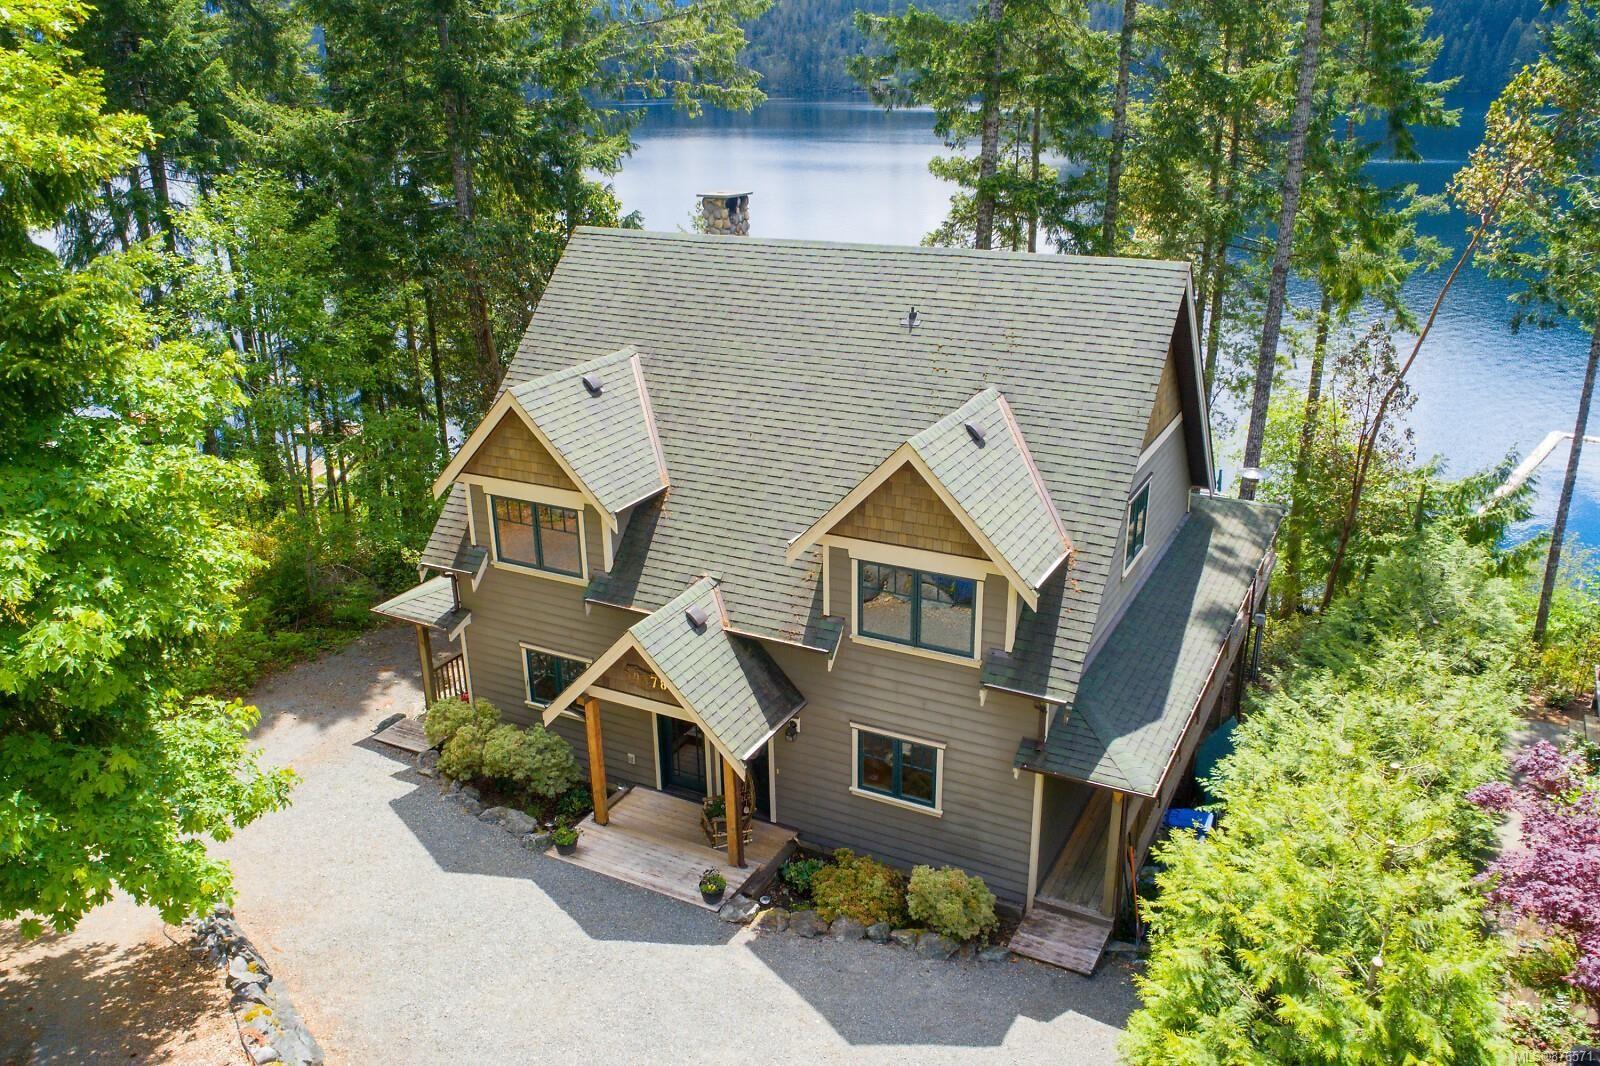 Main Photo: 9578 Creekside Dr in : Du Youbou House for sale (Duncan)  : MLS®# 876571